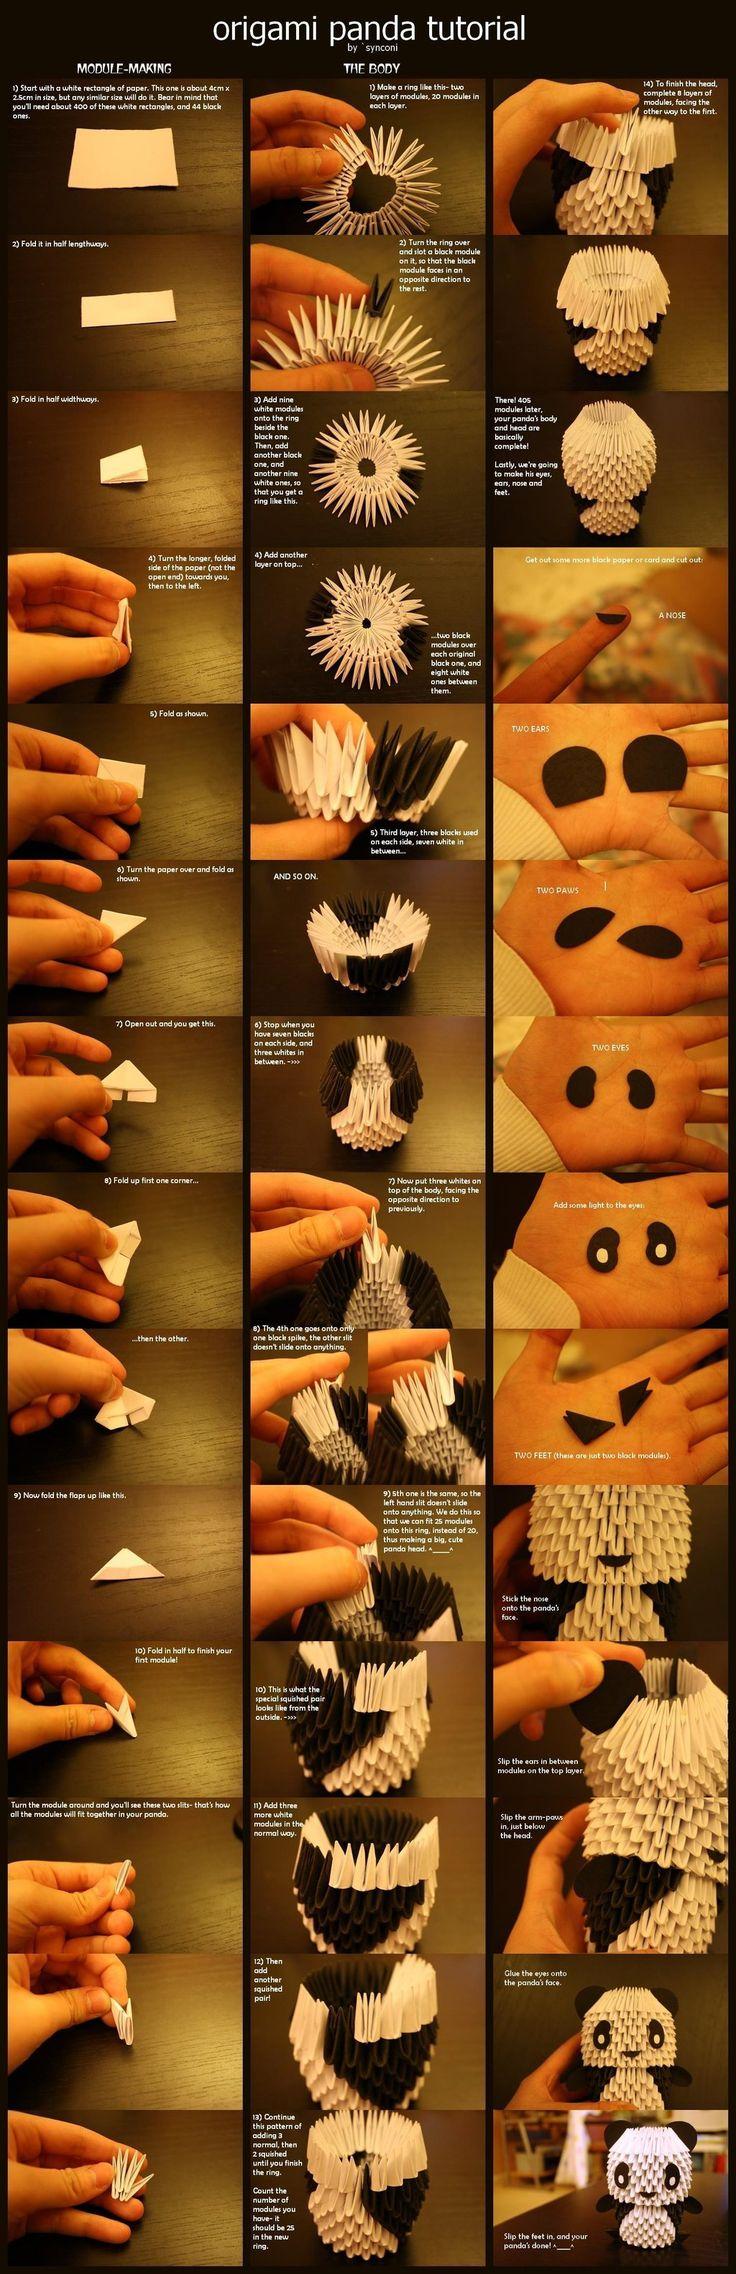 origami_panda_tutorial_by_synconi-d1w4s72.jpg 1,024×3,165 pixels